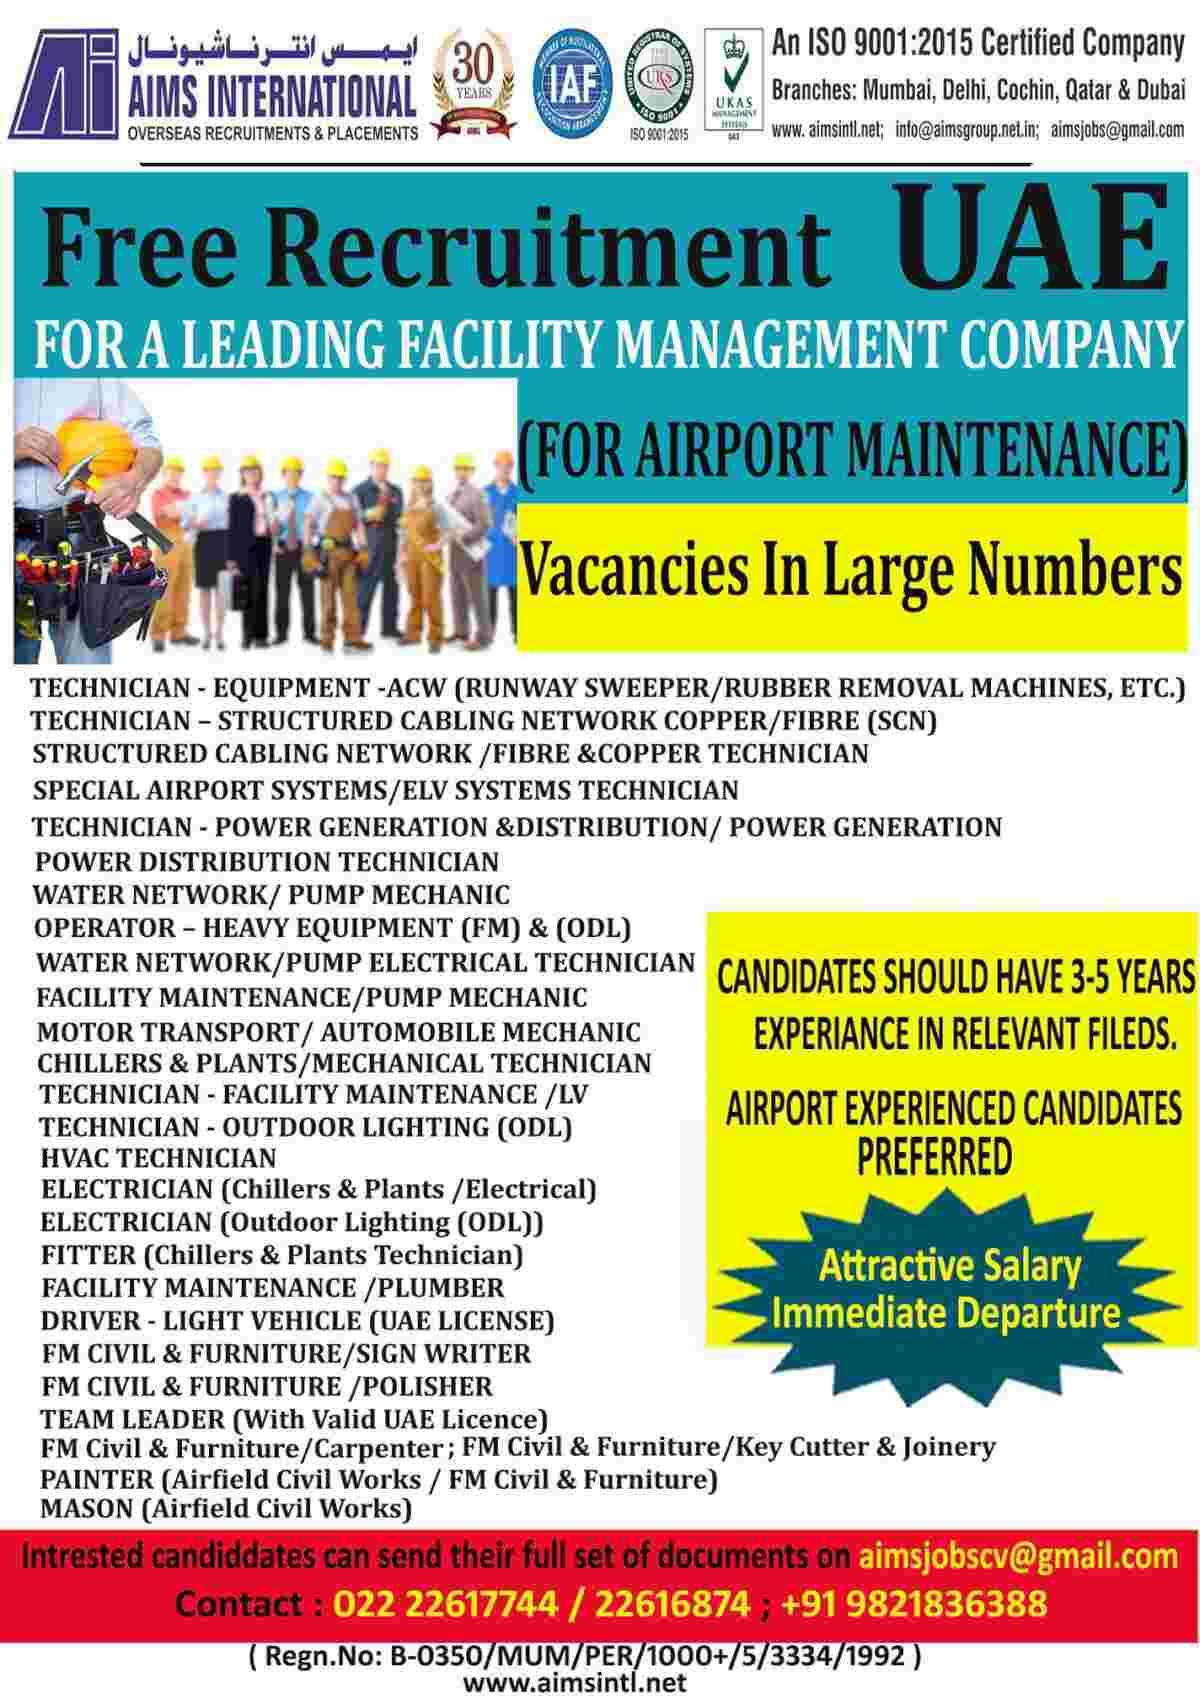 Dubai Airport jobs – Free recruitment for Airport maintenance in UAE